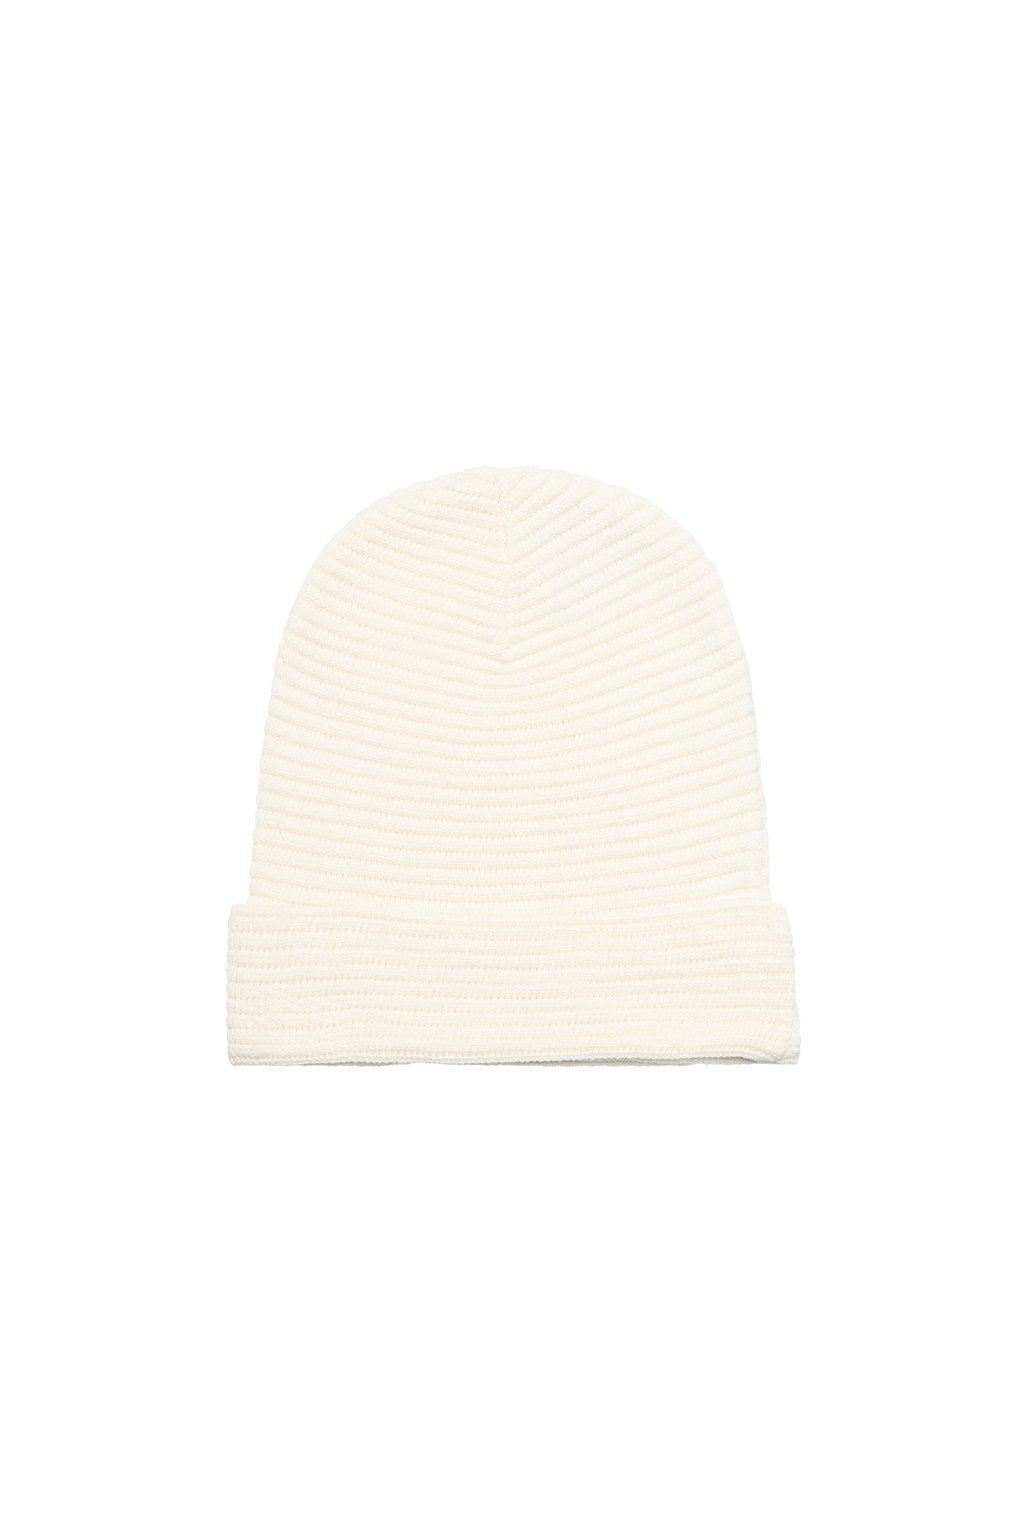 Pletená čapica - krémová (rebrovaná)